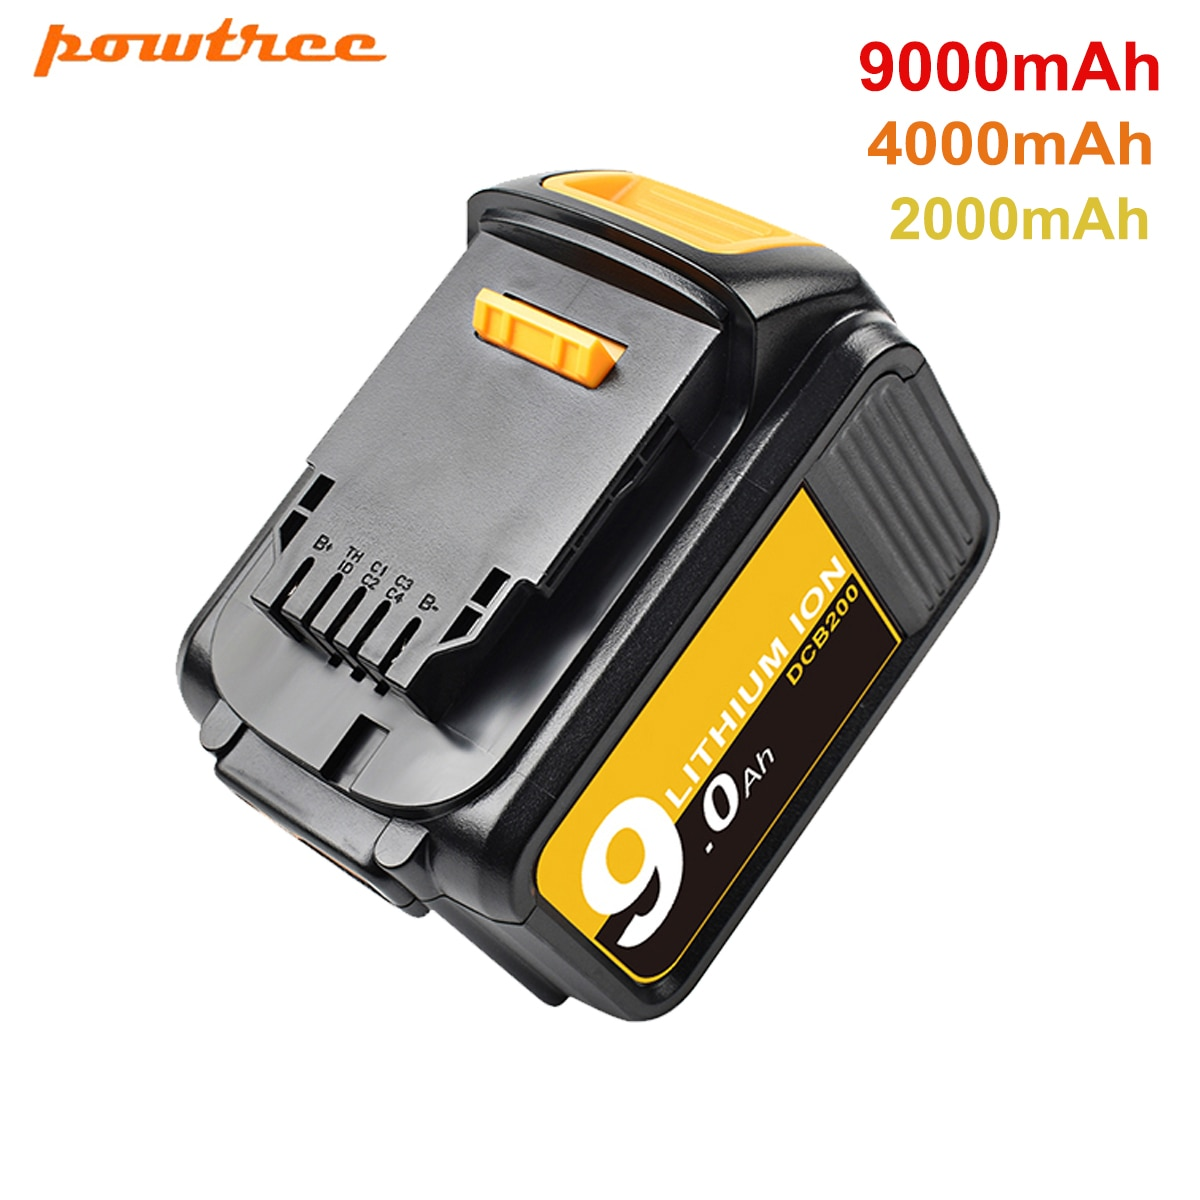 Powtree 18/20V 4.0/9.0Ah DCB200 Replacement Li-ion Battery For DeWalt MAX XR power tool 20V 9000mAh lithium Batteries DCB200 184